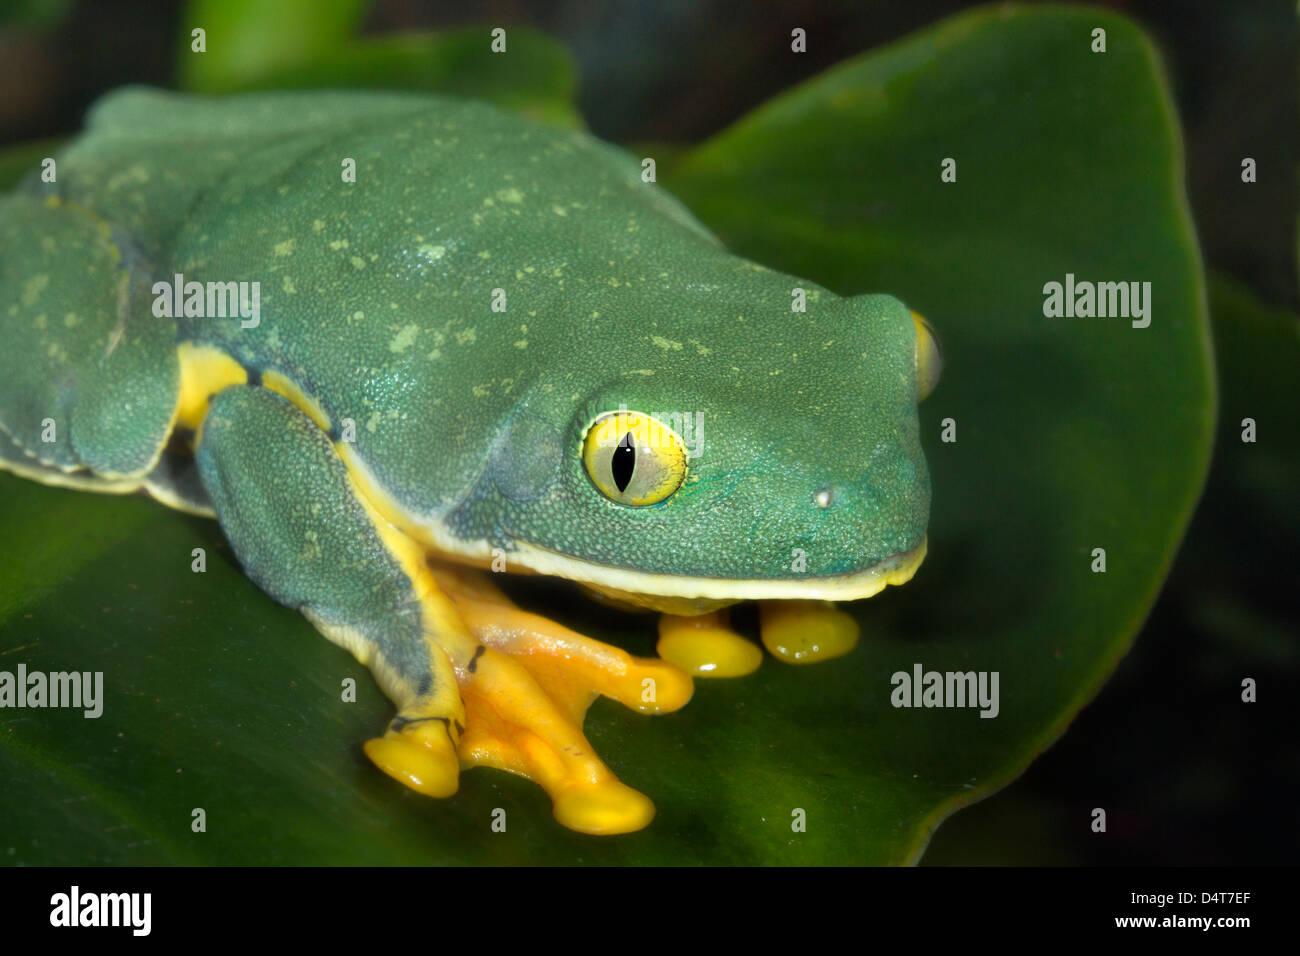 The splendid leaf frog (Cruziohyla calcarifer) portrait. Atlanta Botanical Garden (Georgia, USA). Stock Photo